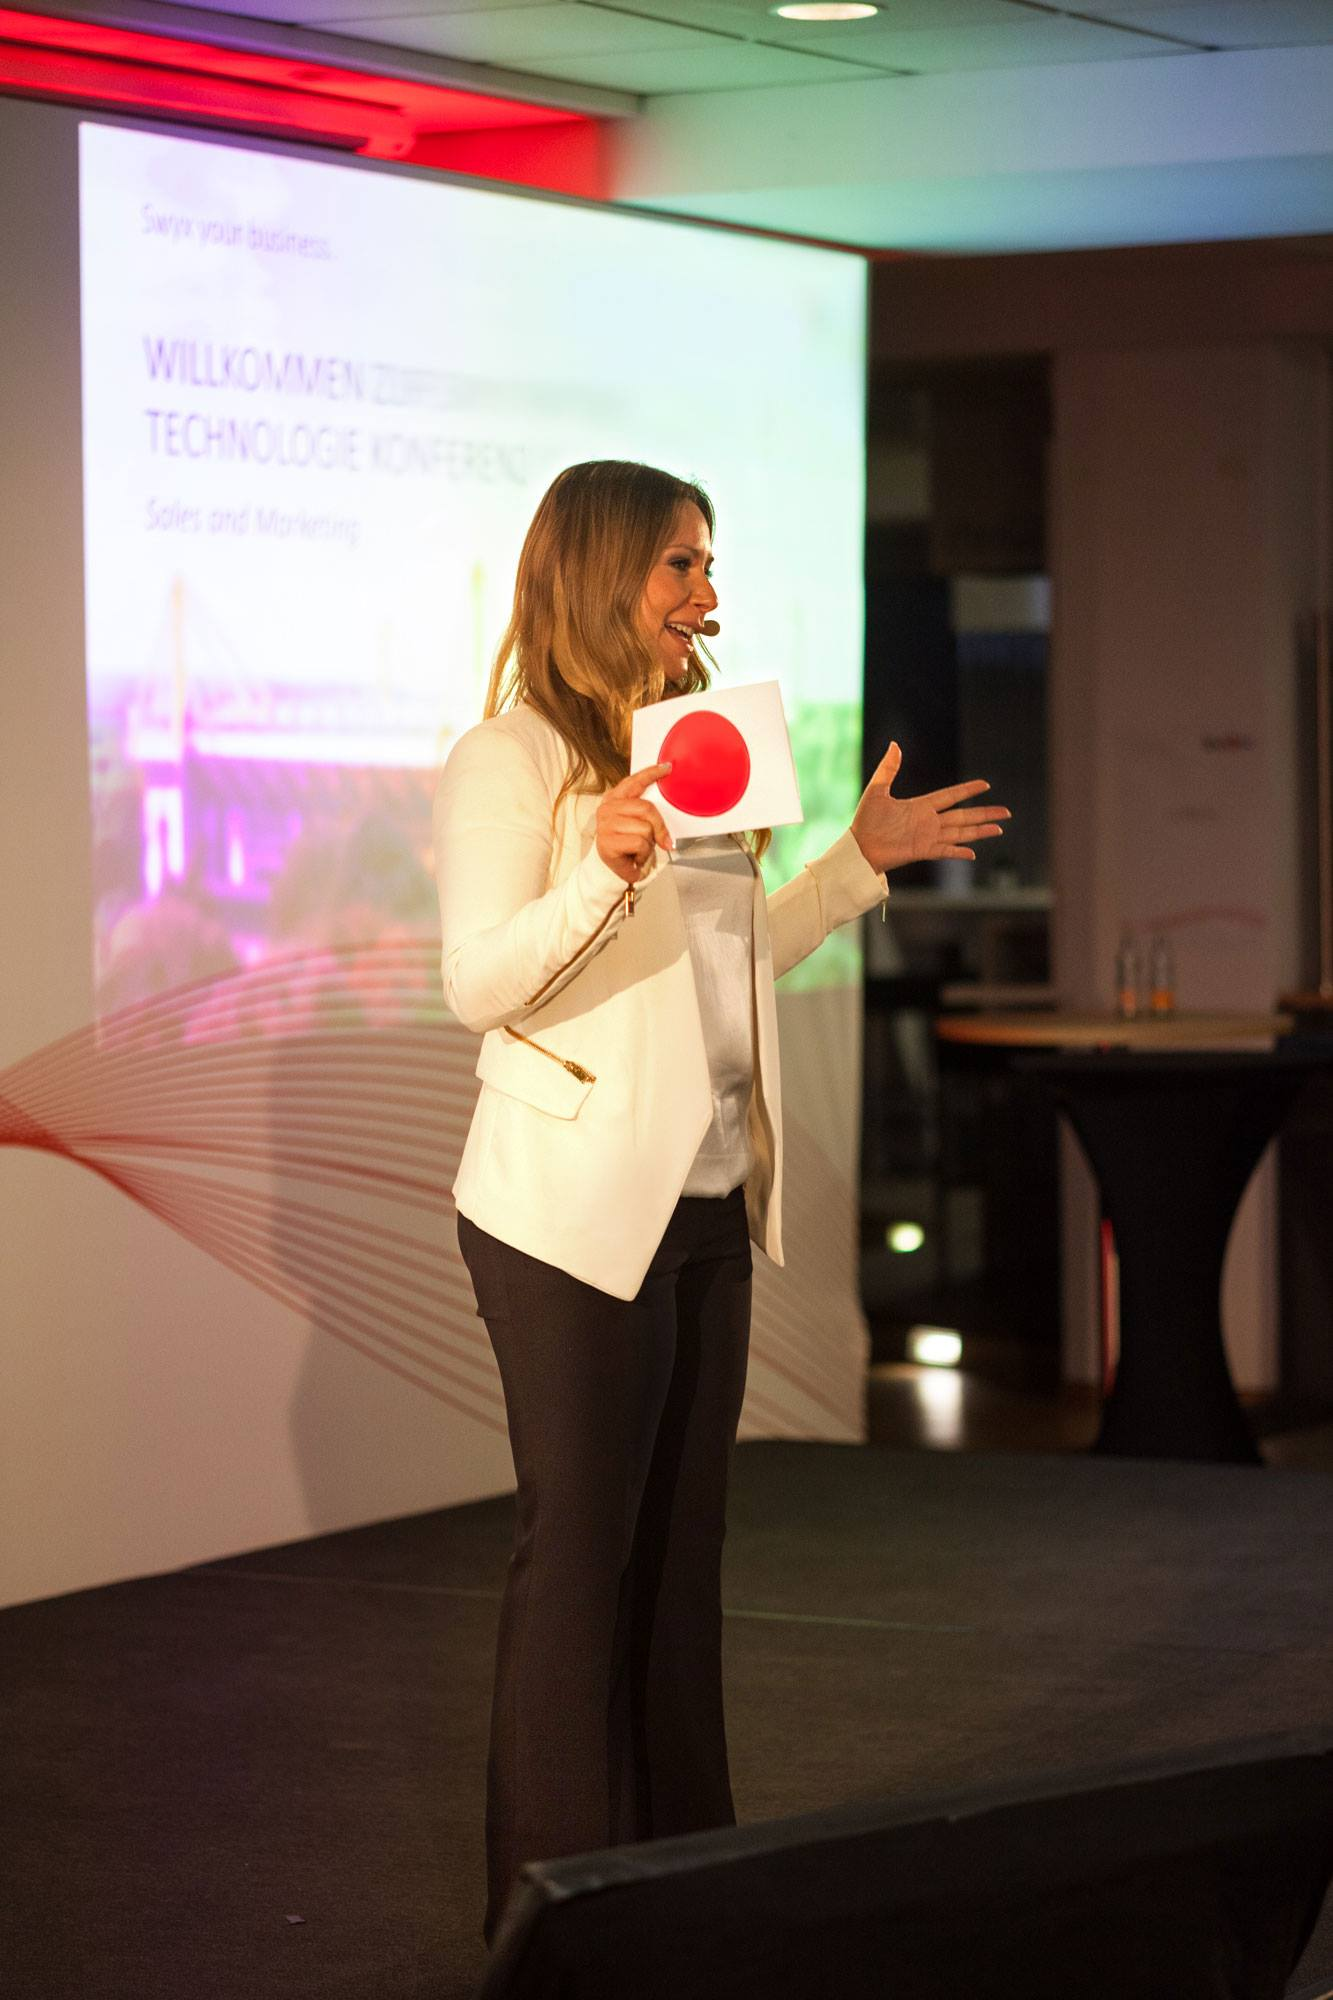 Messemoderation in Köln mit Awardverleihung